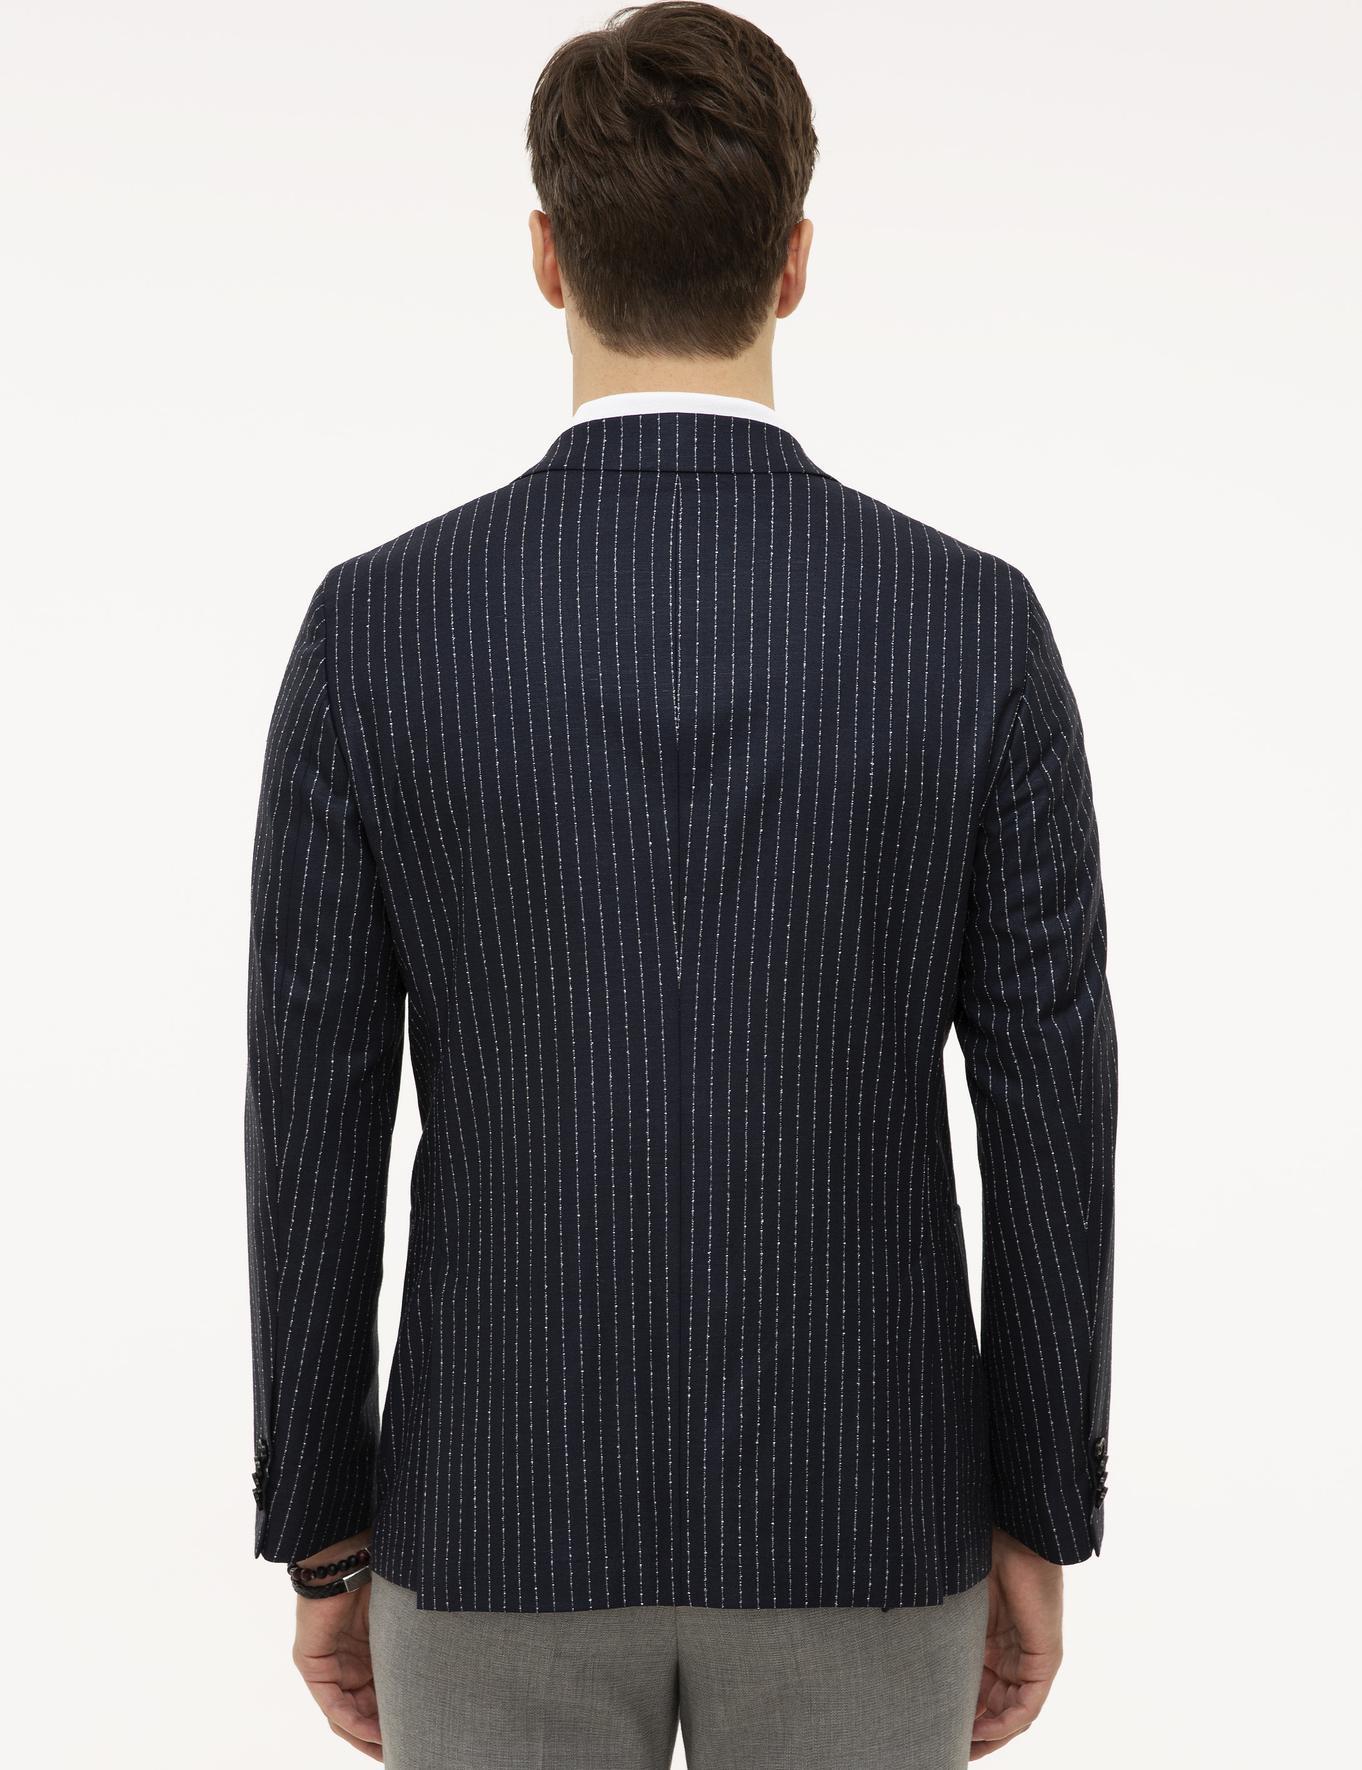 Lacivert Slim Fit Ceket - 50223286043